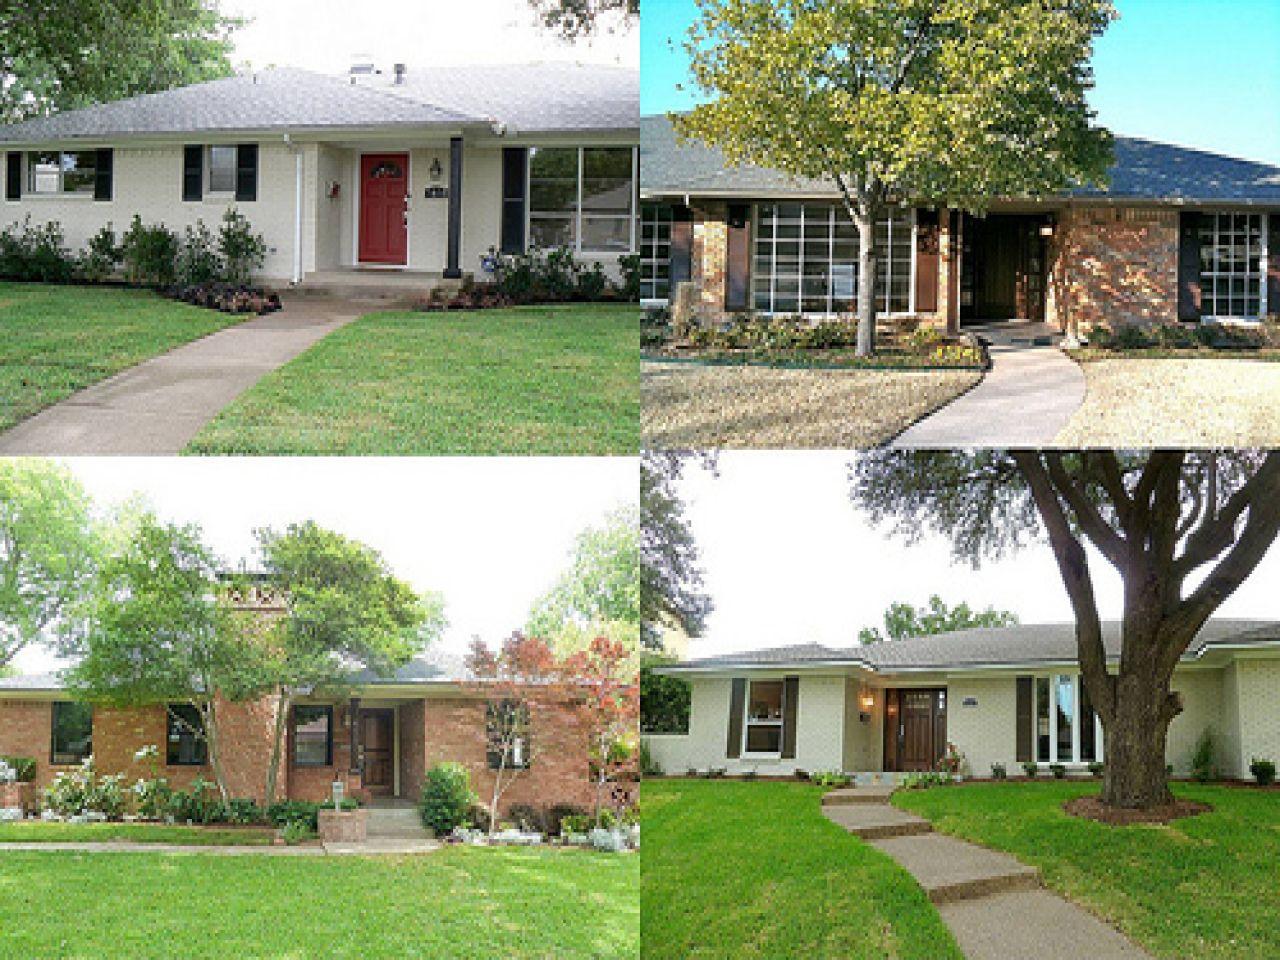 Painted Brick House Blue : Rickyhil Outdoor Ideas ... on Brick House Painting Ideas  id=66855